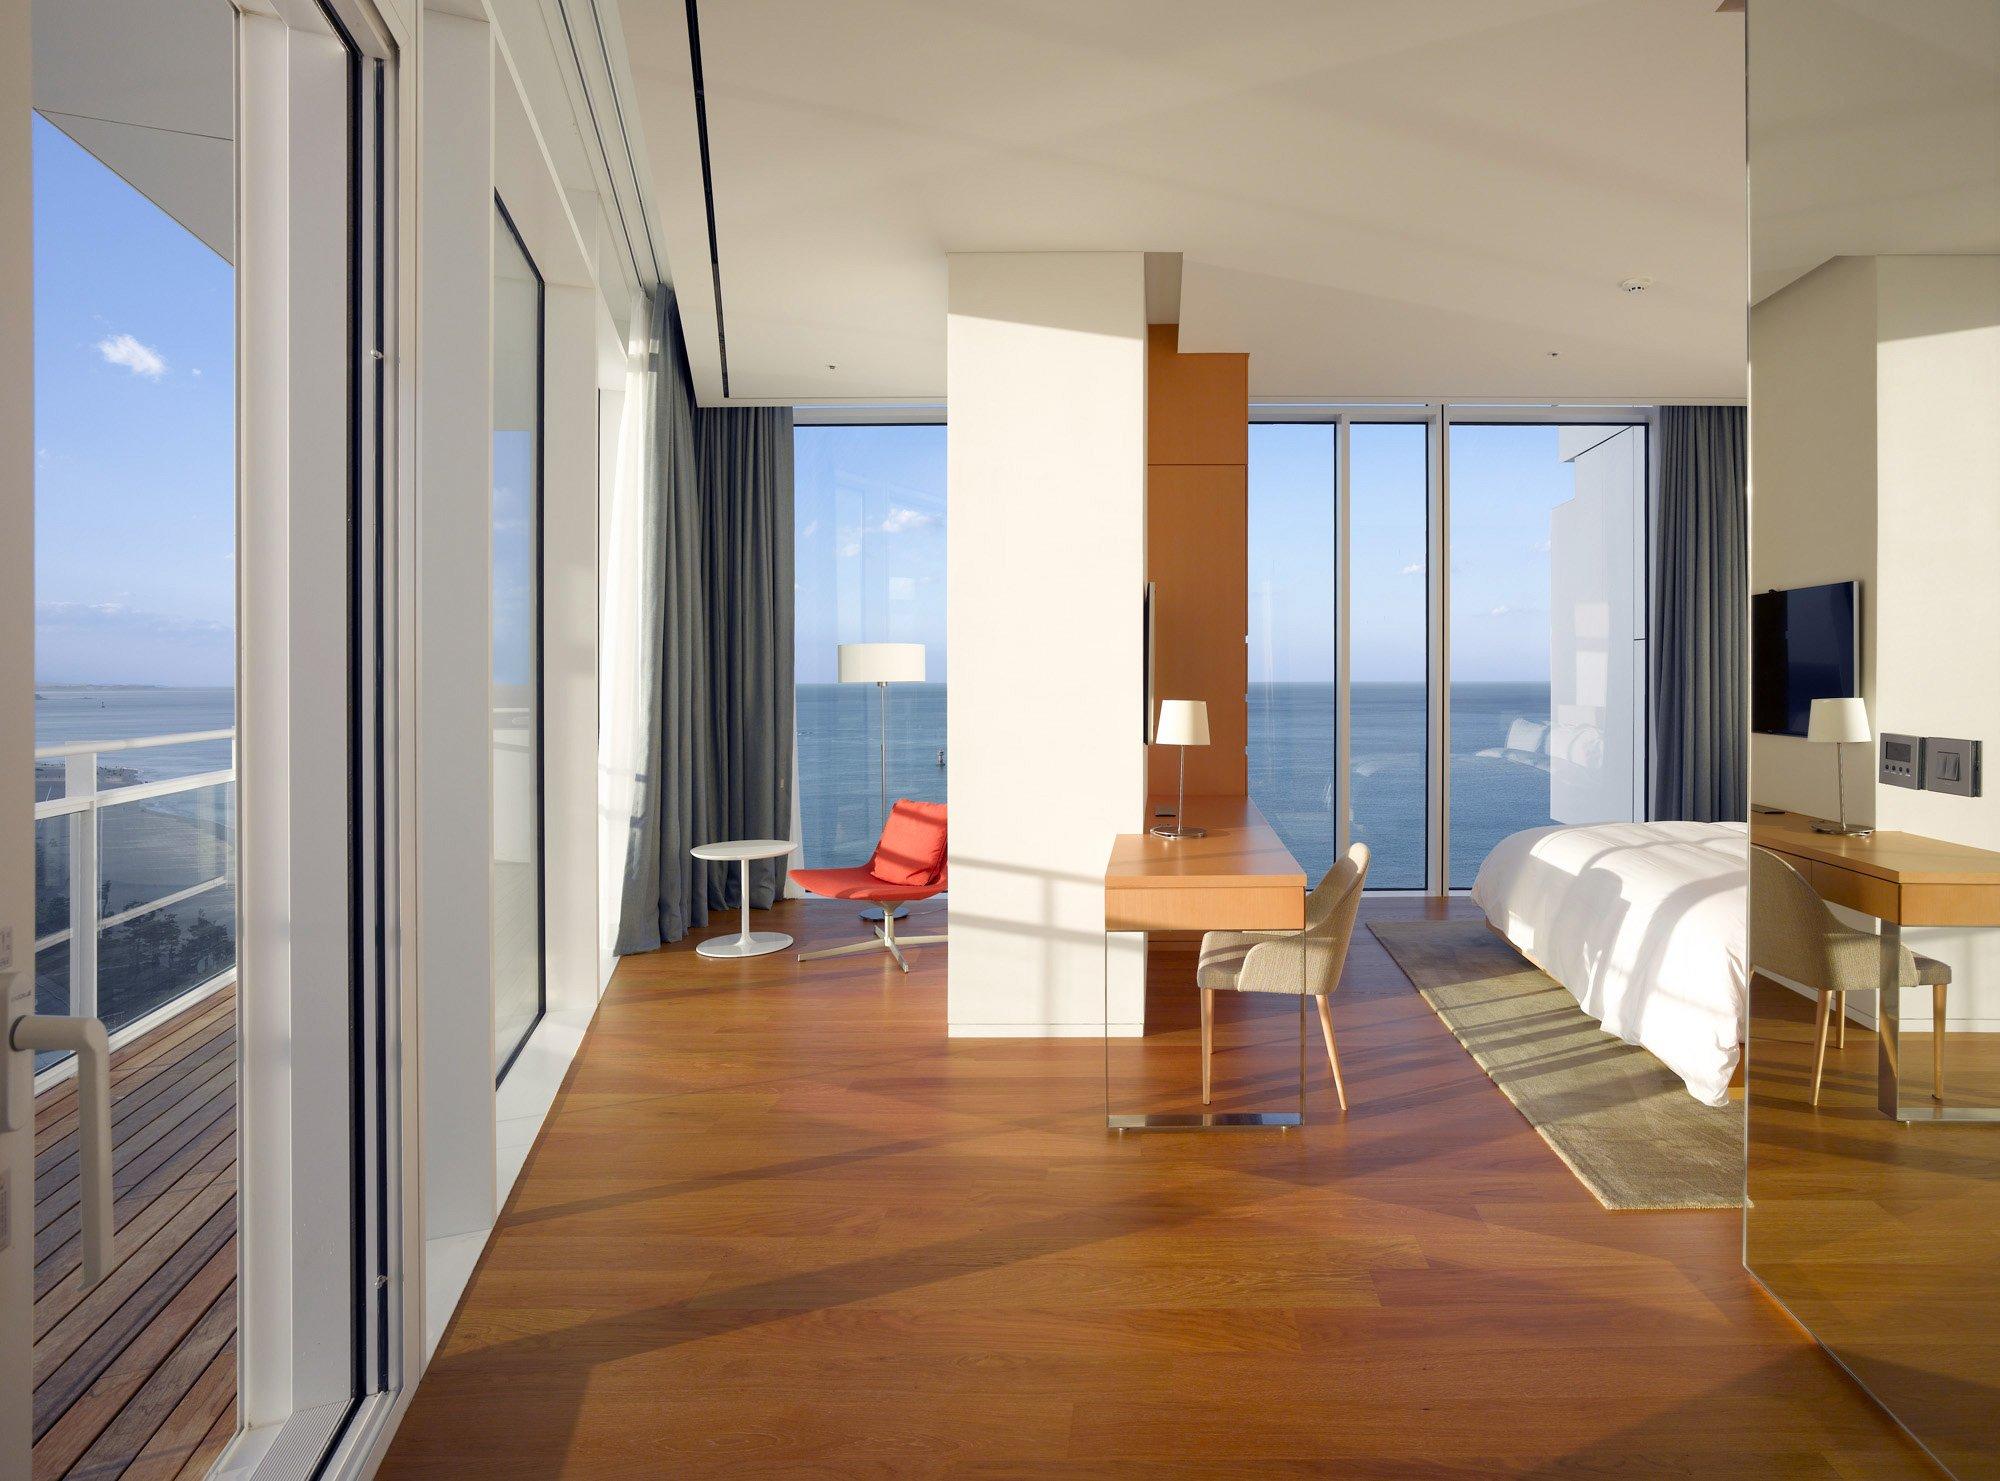 Seamarq Hotel by Richard Meier & Partners Architects © Roland Halbe